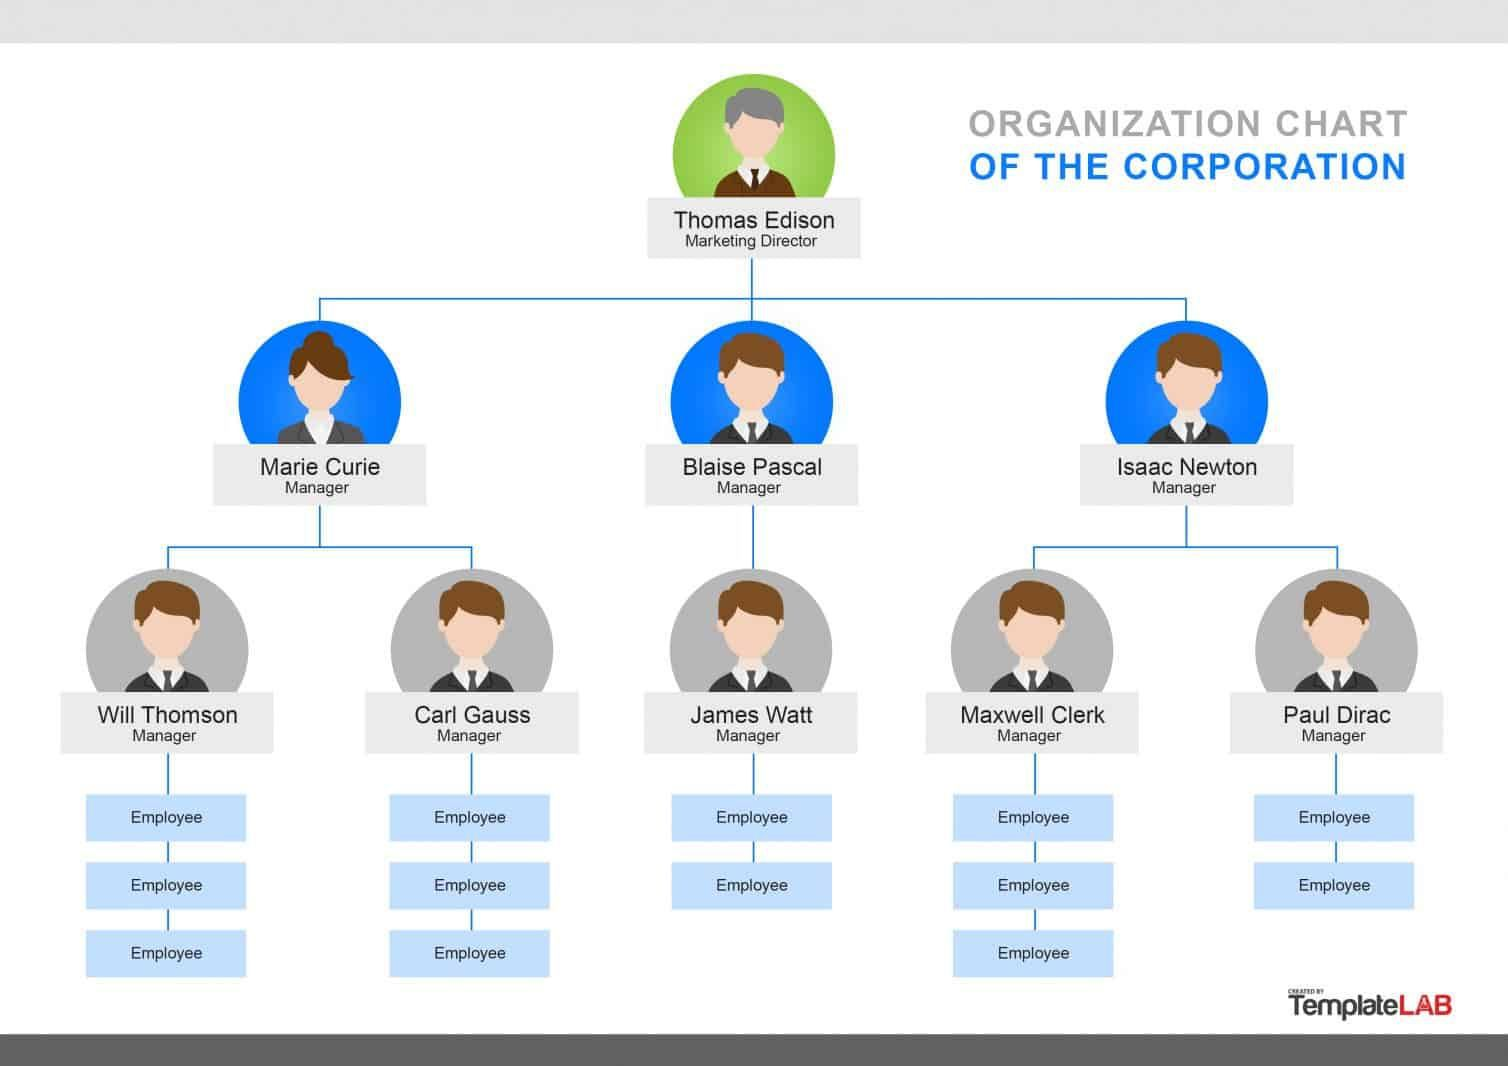 001 Fascinating Org Chart Template Powerpoint Photo  Organization Free Download Organizational 2010 2013Full